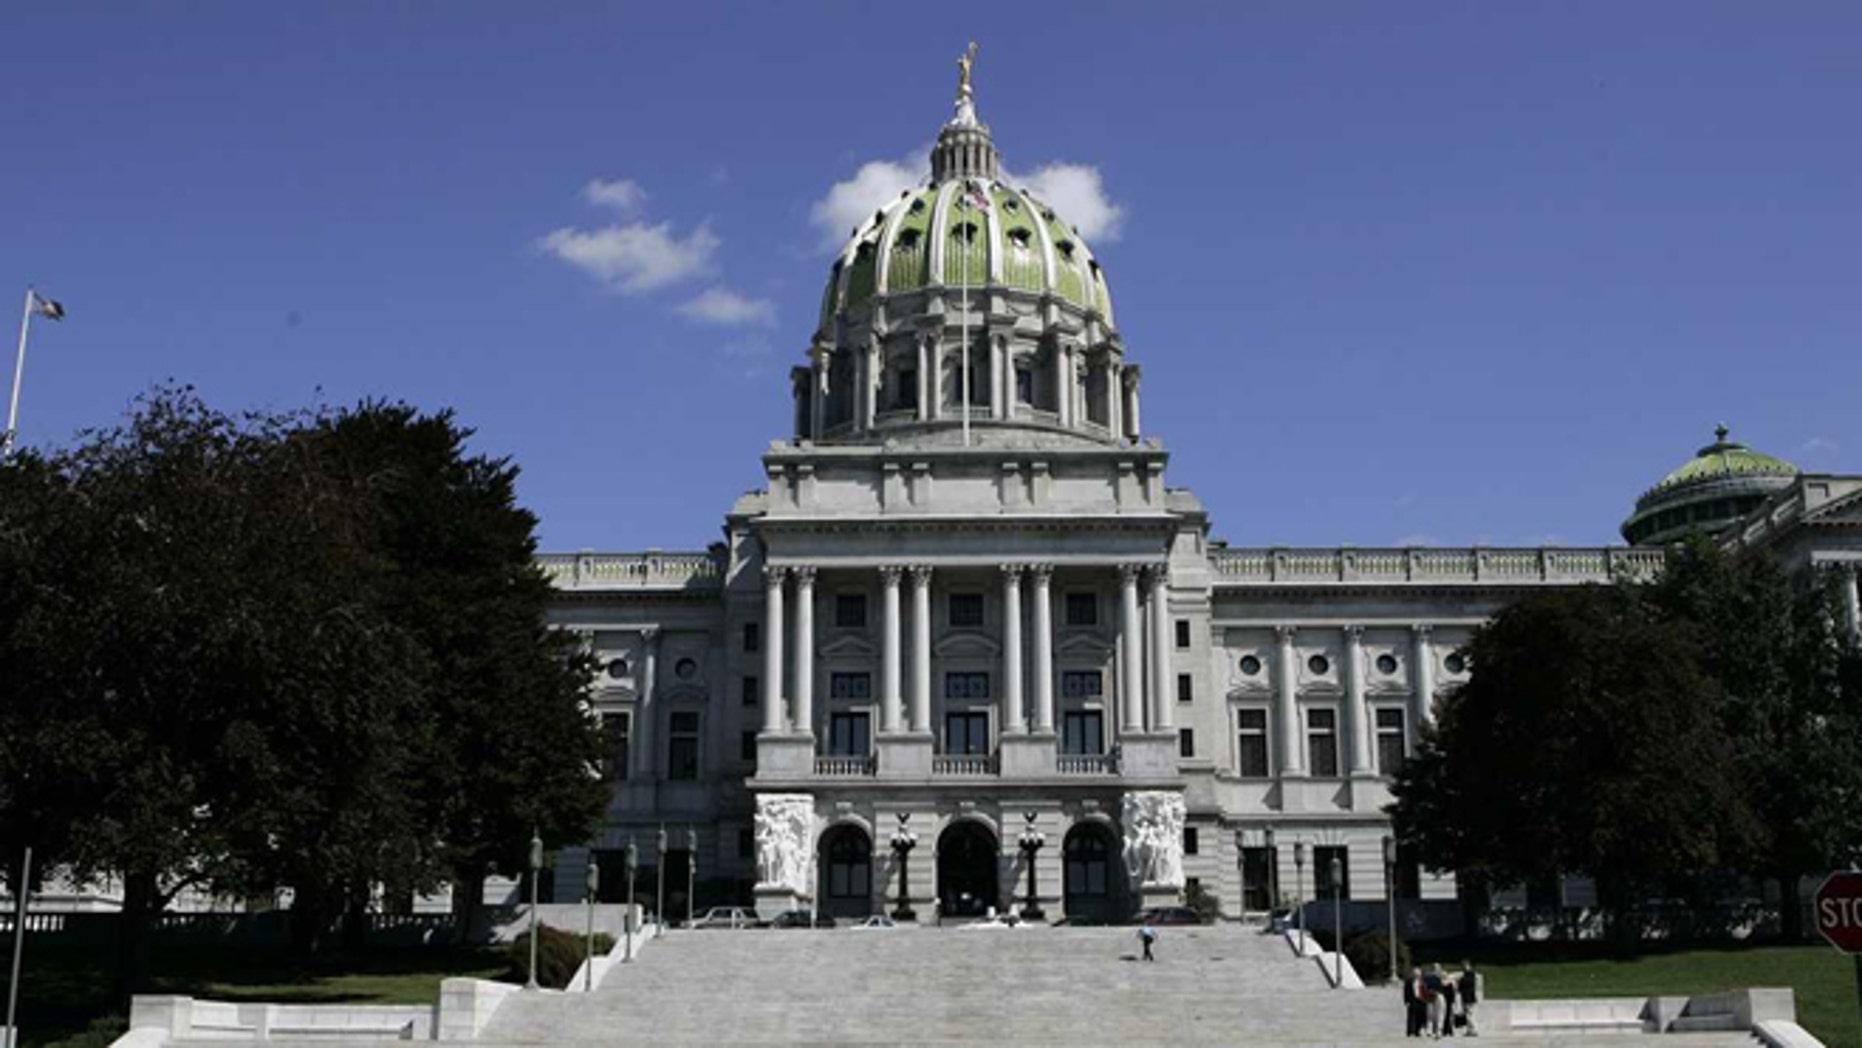 The Pennsylvania State Capitol in Harrisburg. (AP)